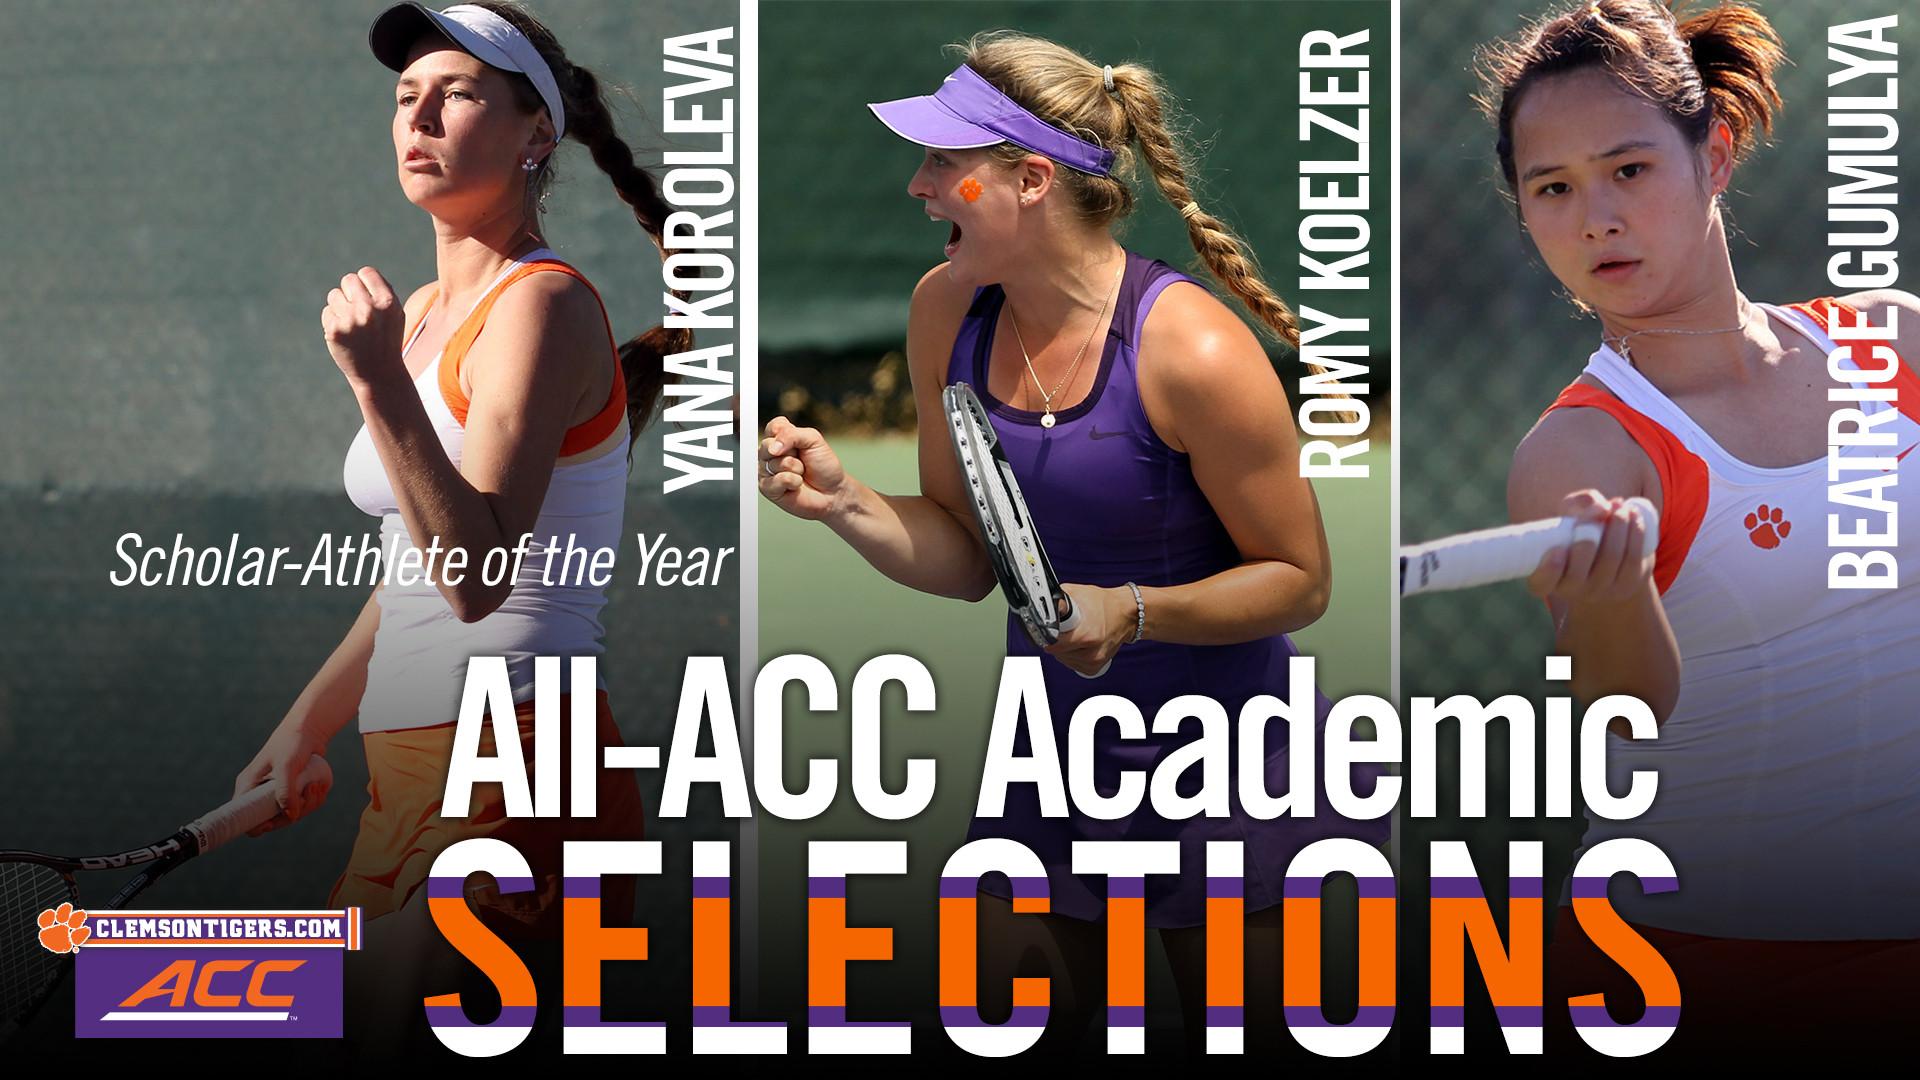 Koroleva Headlines All-ACC Academic Team as Scholar-Athlete of the Year